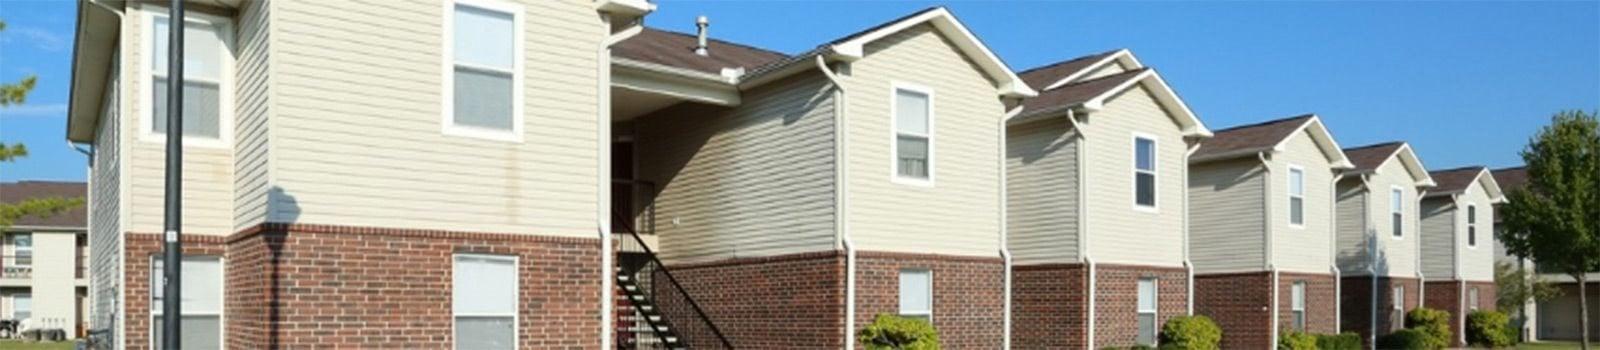 Apartment buildings exterior_Cameron Creek Apartments, Galloway, OH 43119